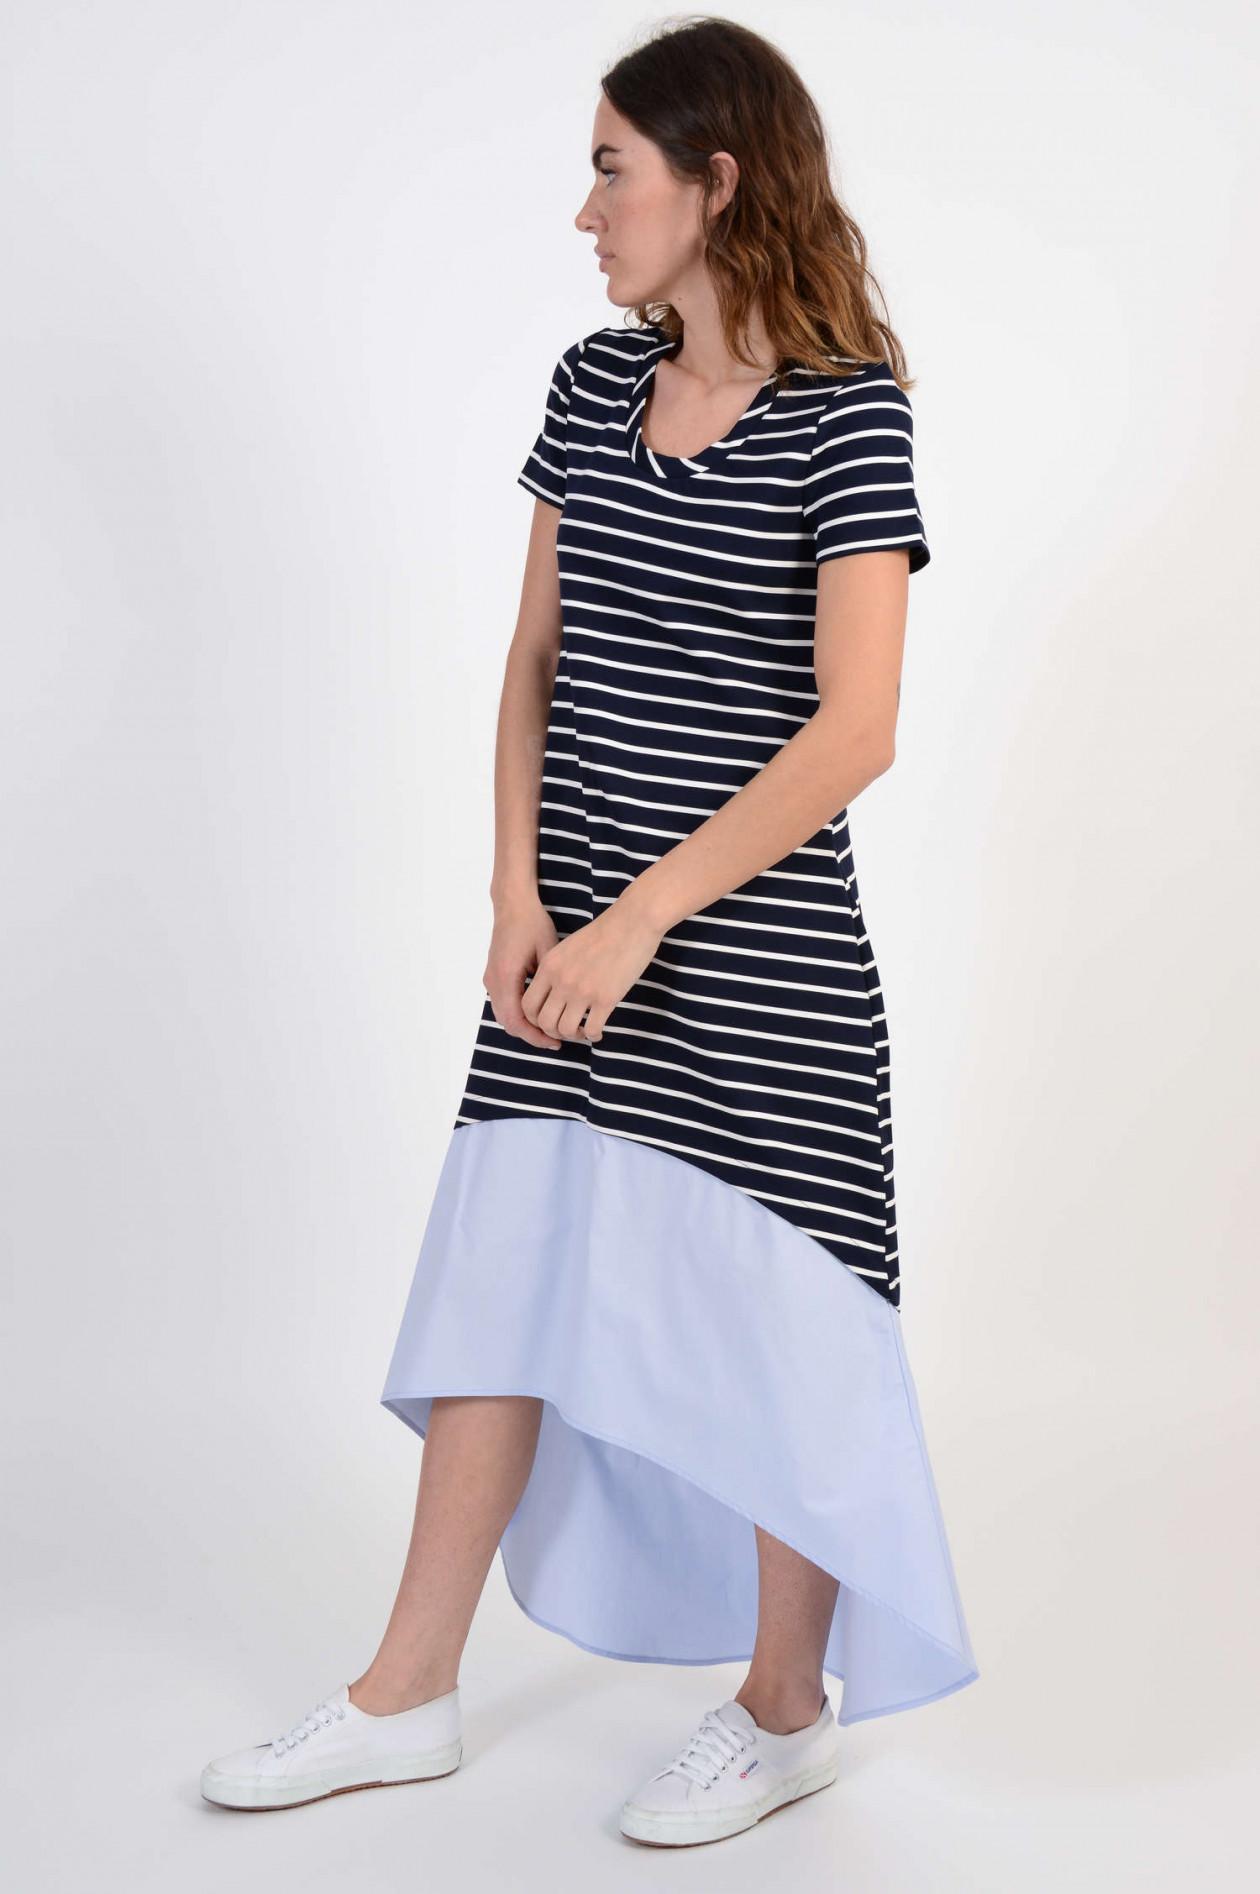 vokuhila kleid in blau/weiß gestreift